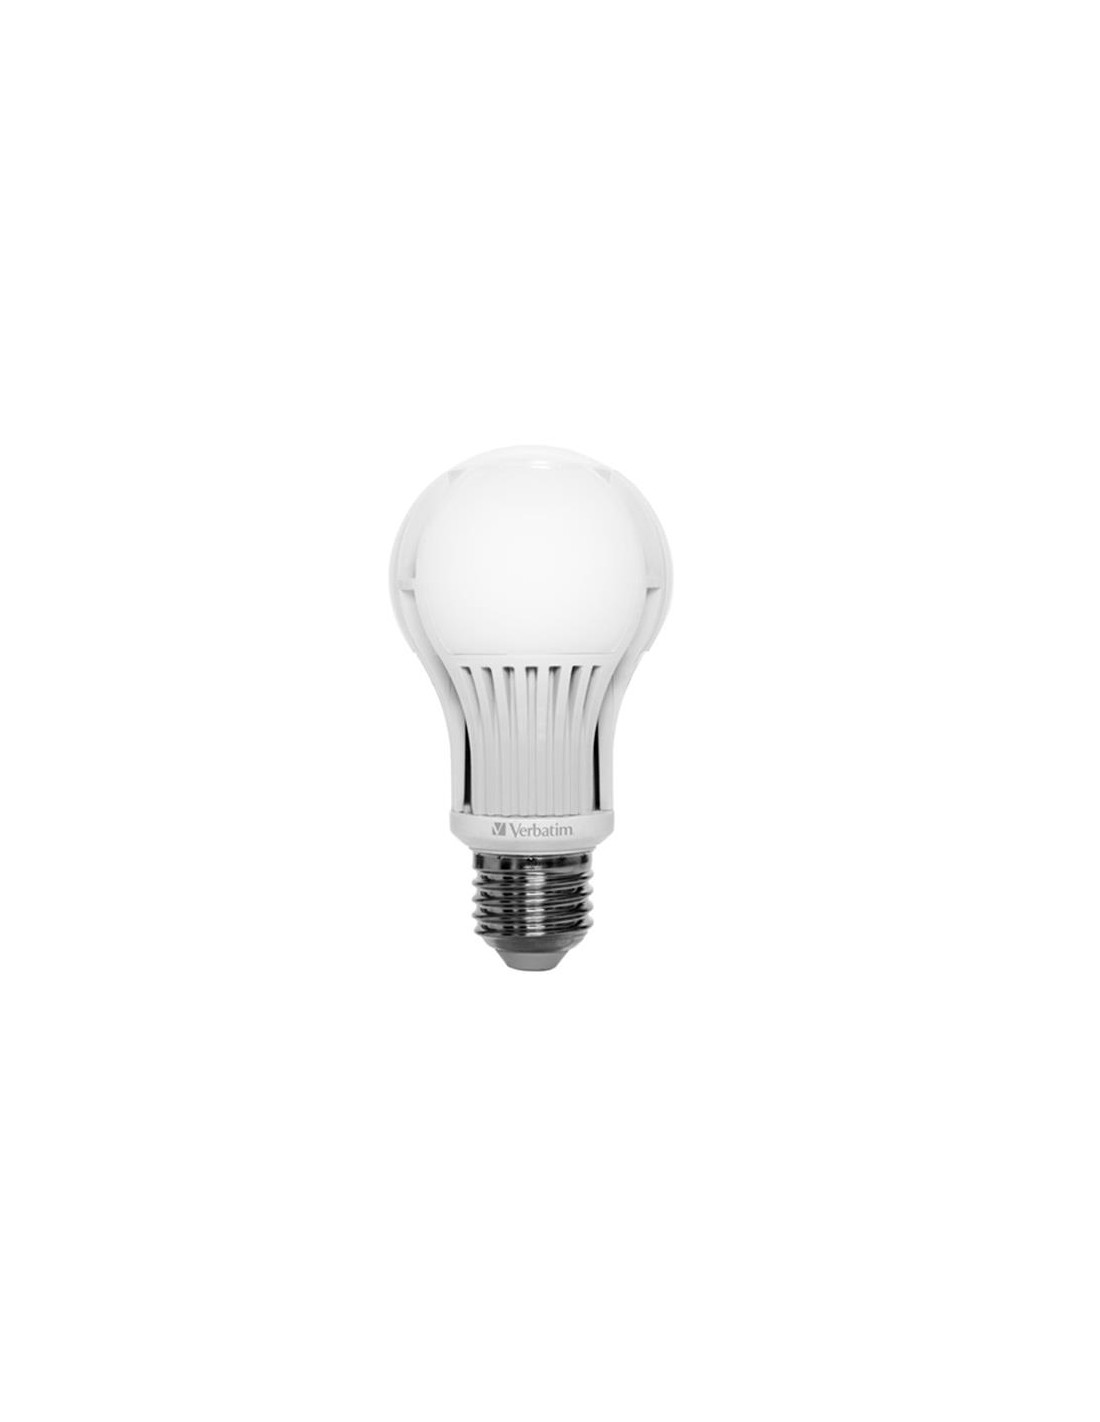 ampoule e27 14w led blanc chaud. Black Bedroom Furniture Sets. Home Design Ideas